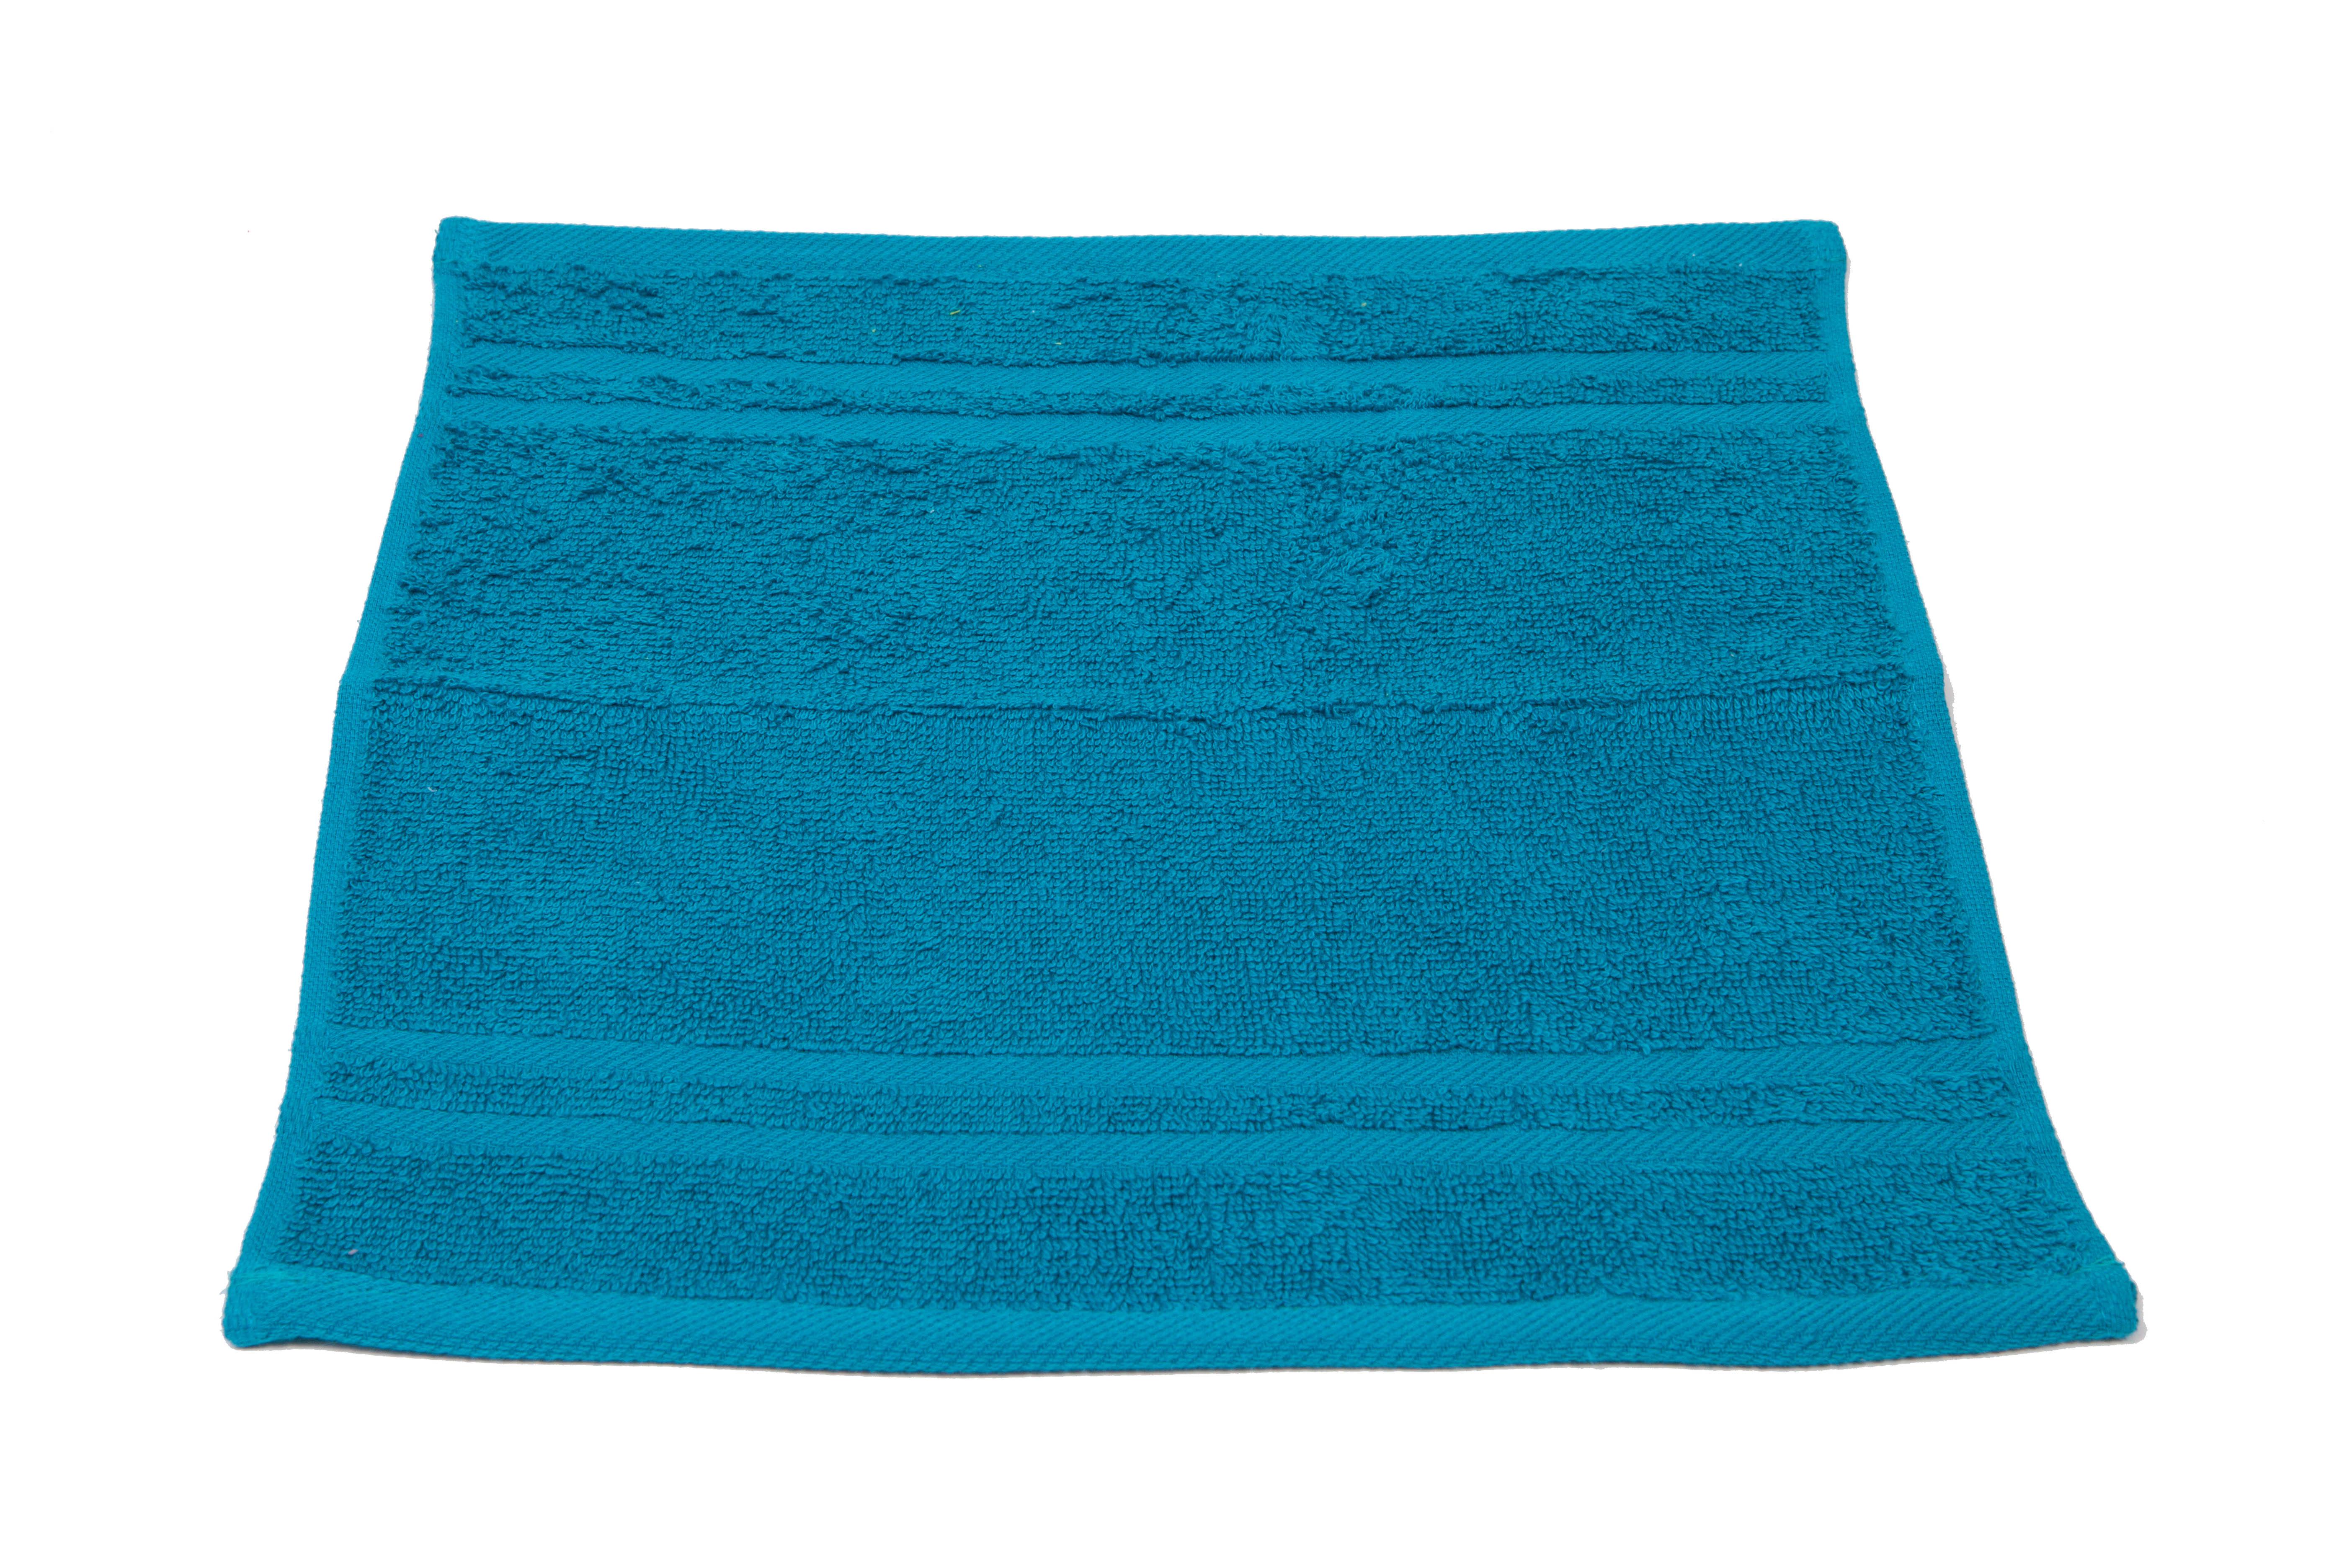 Купить Полотенца Arloni, Полотенце Marvel Цвет: Бирюзовый (33х33 см), Индия, Махра